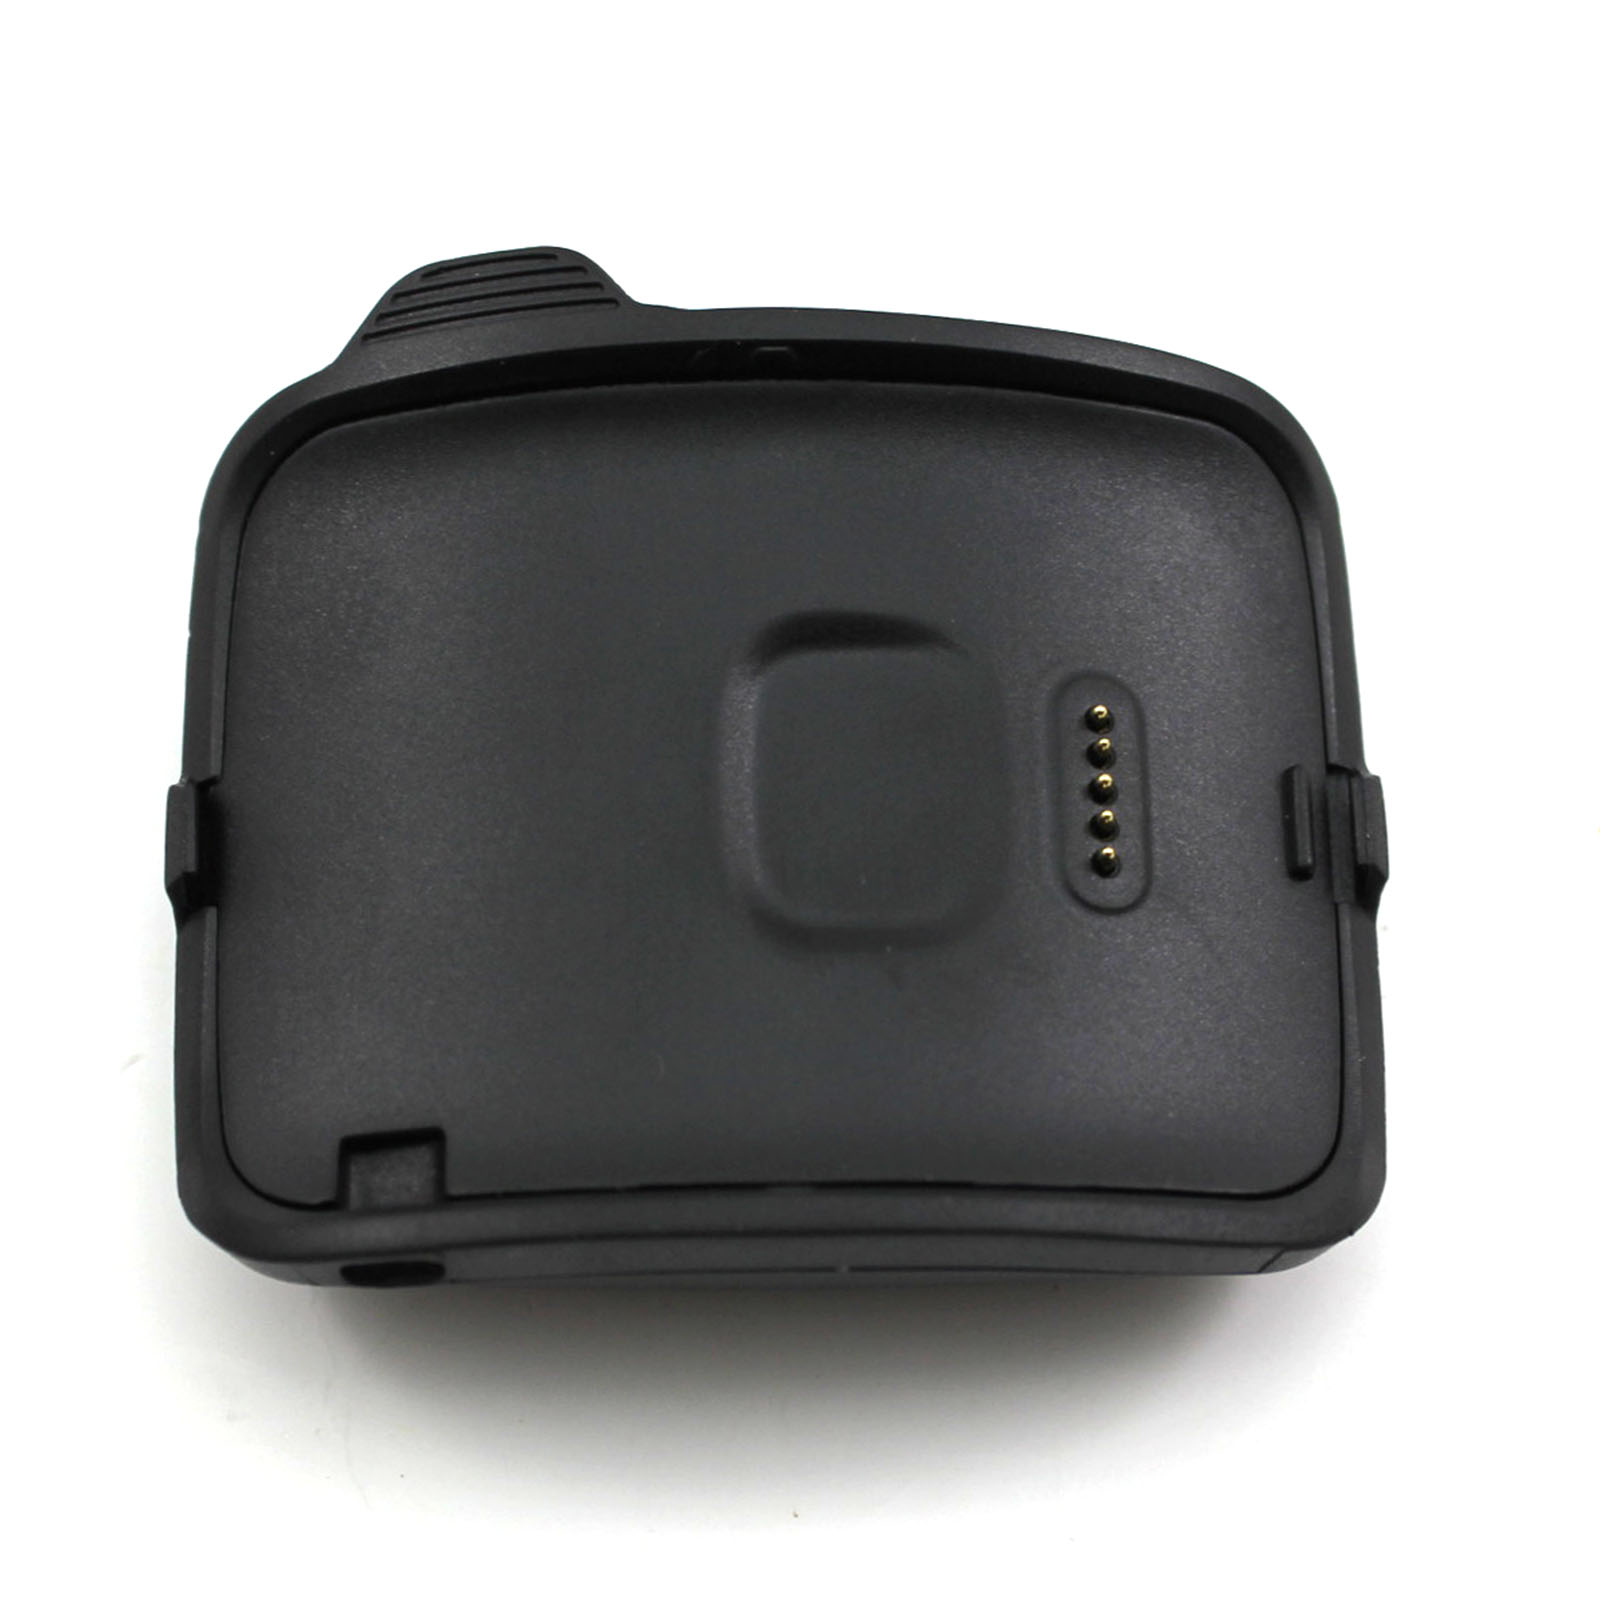 Portable Desktop Power Cradle Dock Holder Charger For Samsung Gear S Smart Watch R750